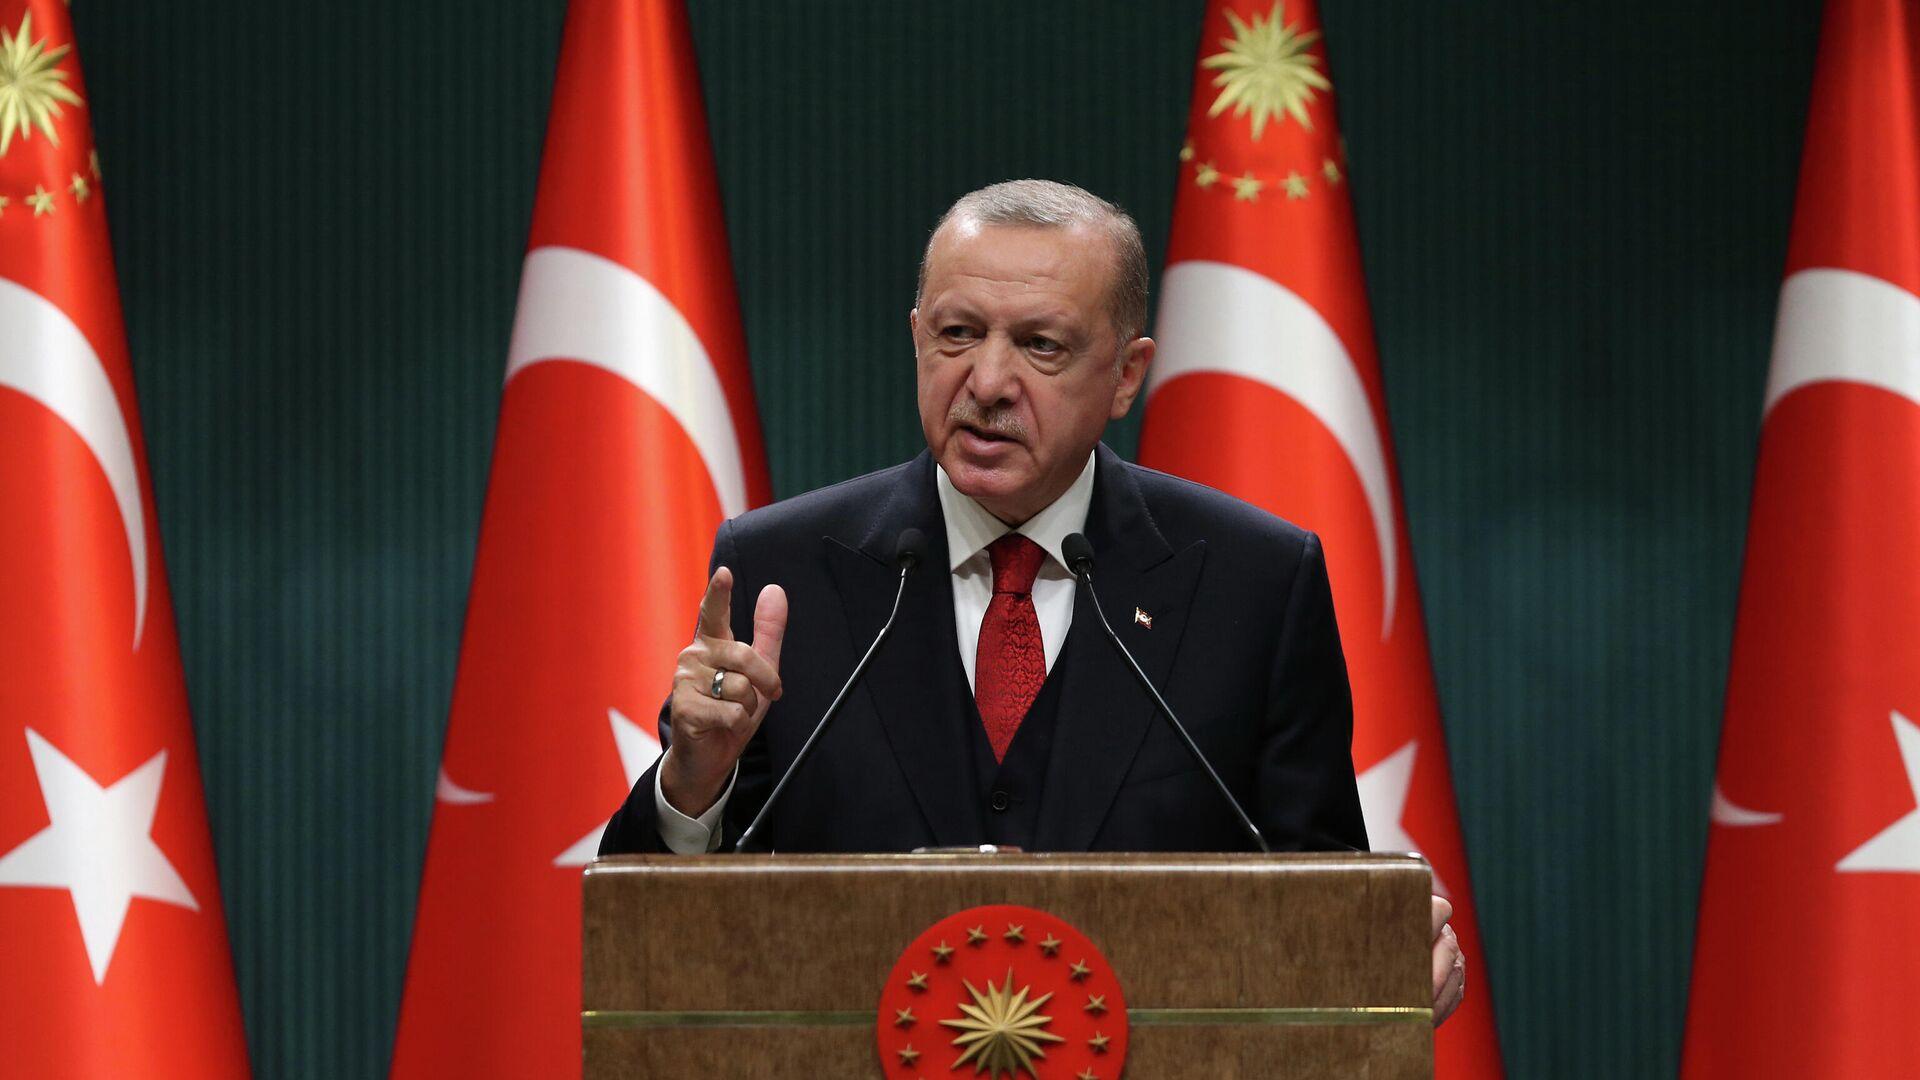 Президент Турции Реджеп Тайип Эрдоган в Анкаре  - РИА Новости, 1920, 07.10.2020